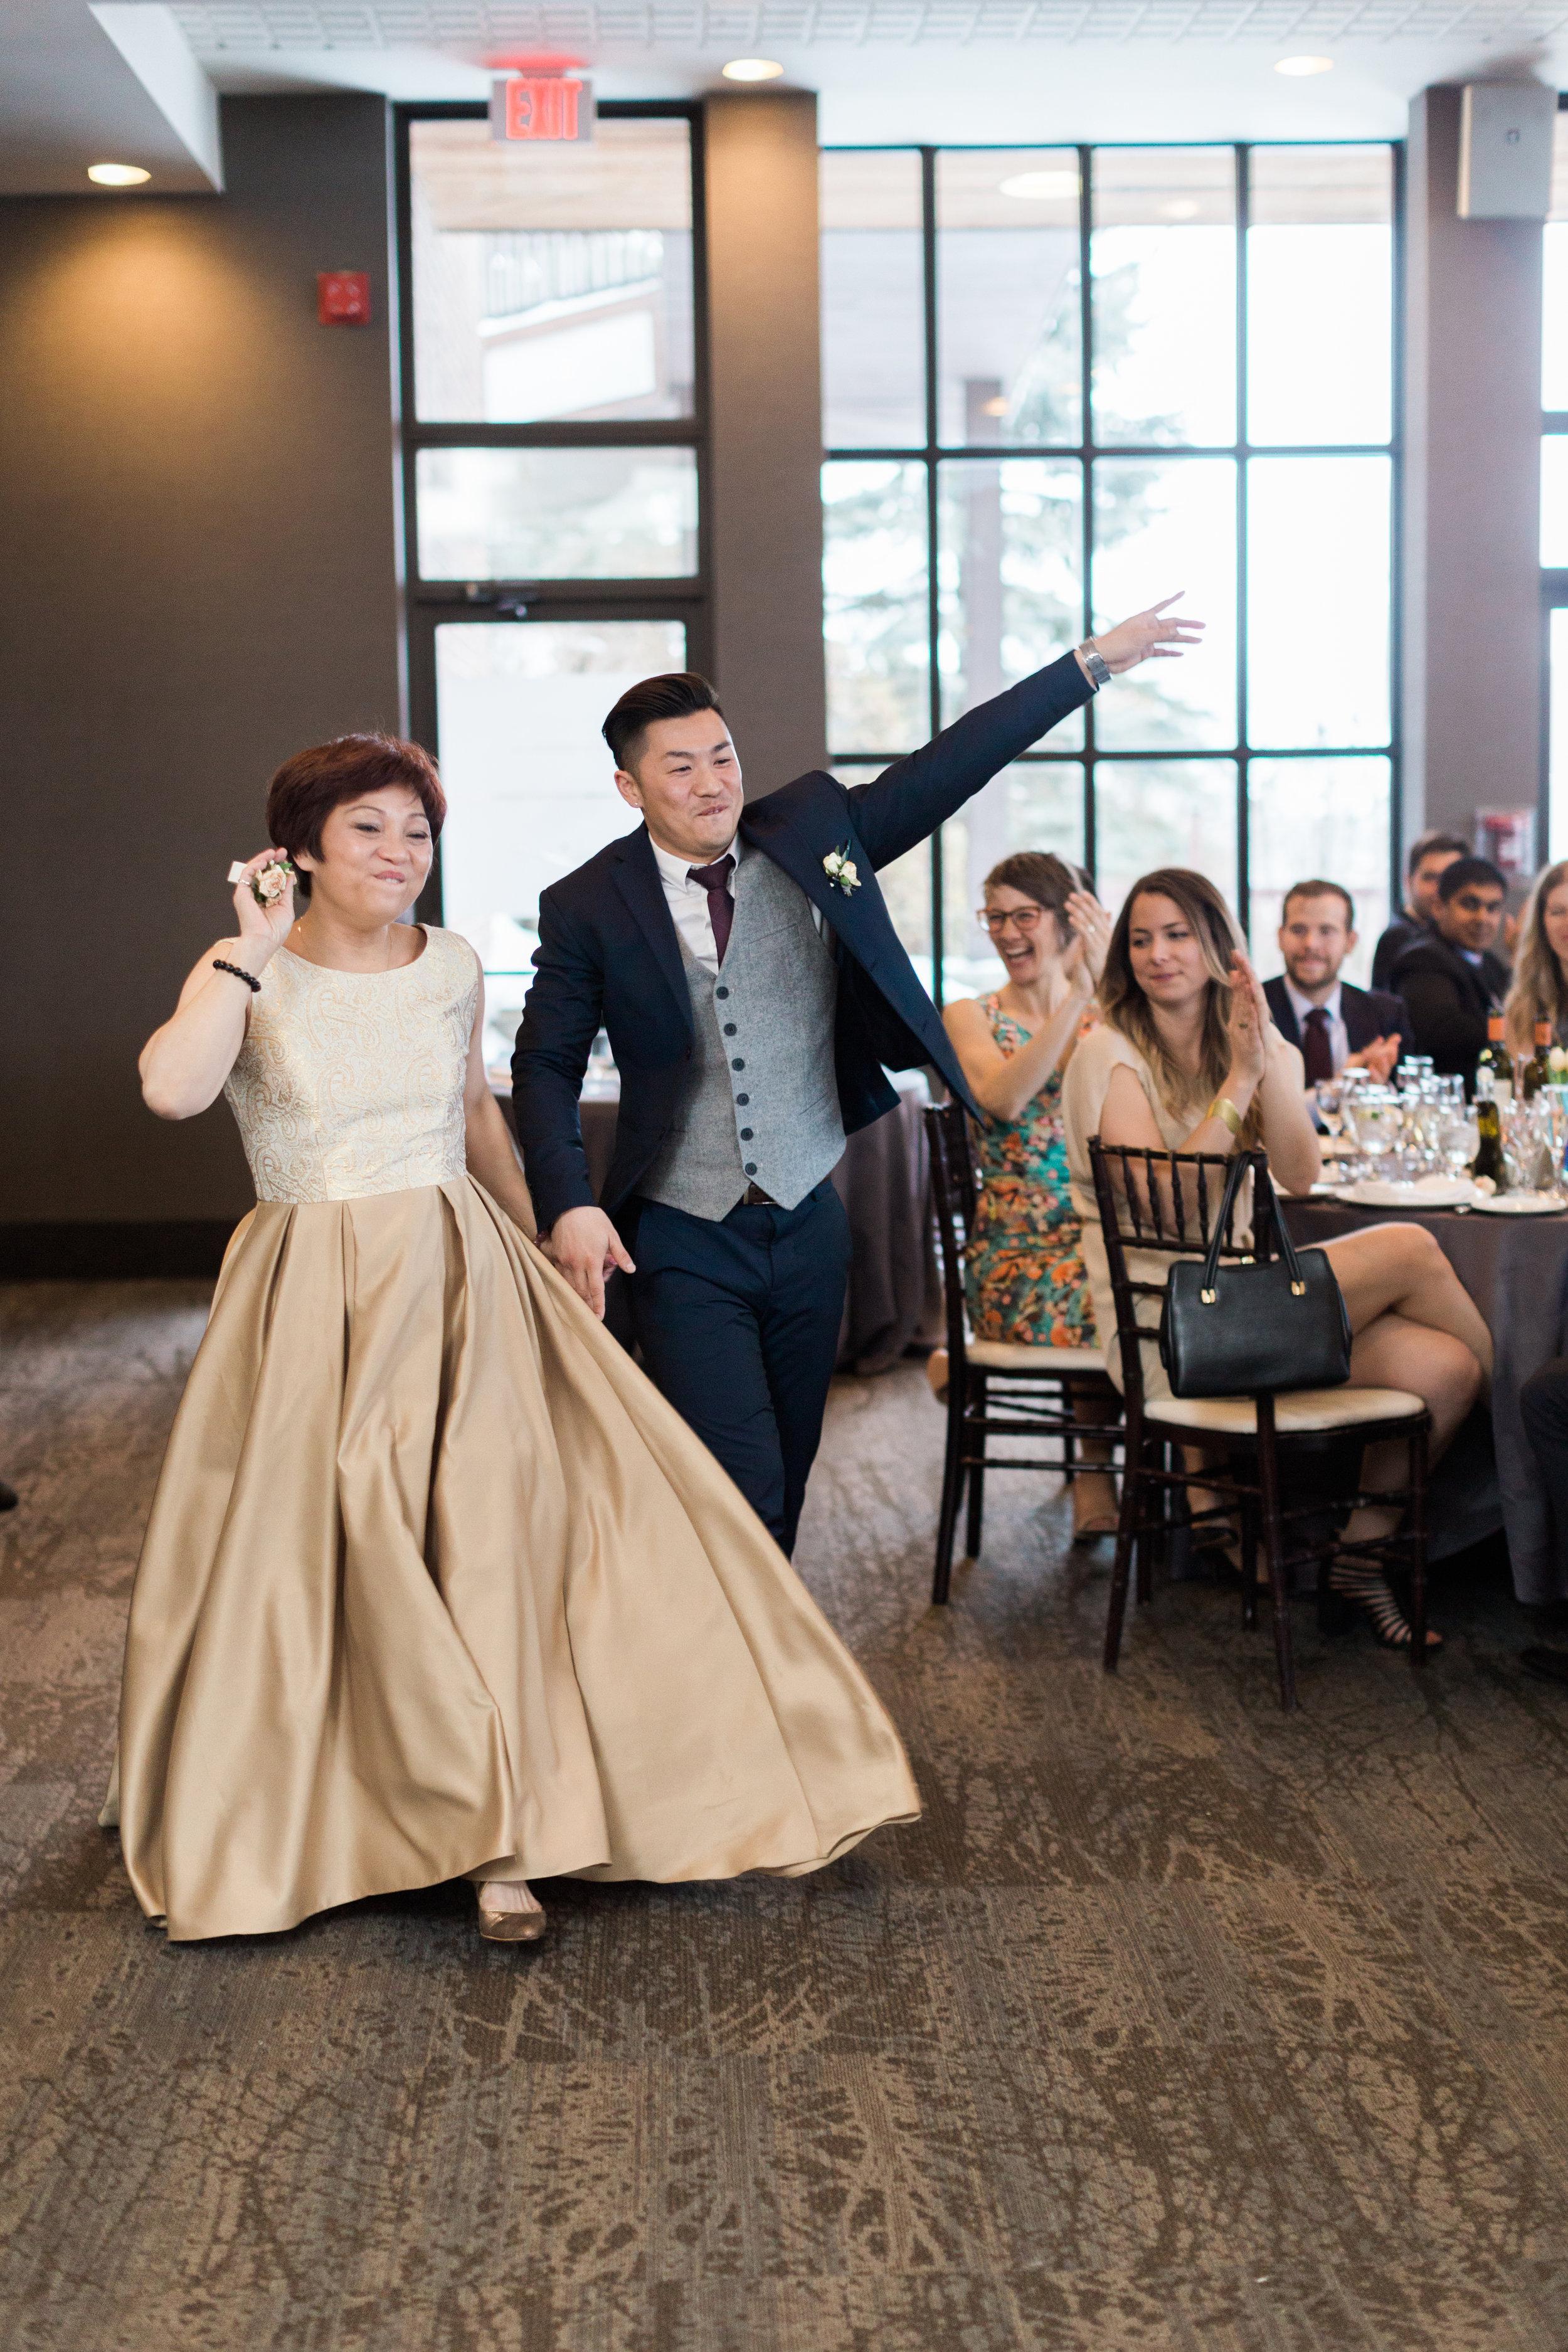 The Manor Winter Wedding - Reception-72.jpg